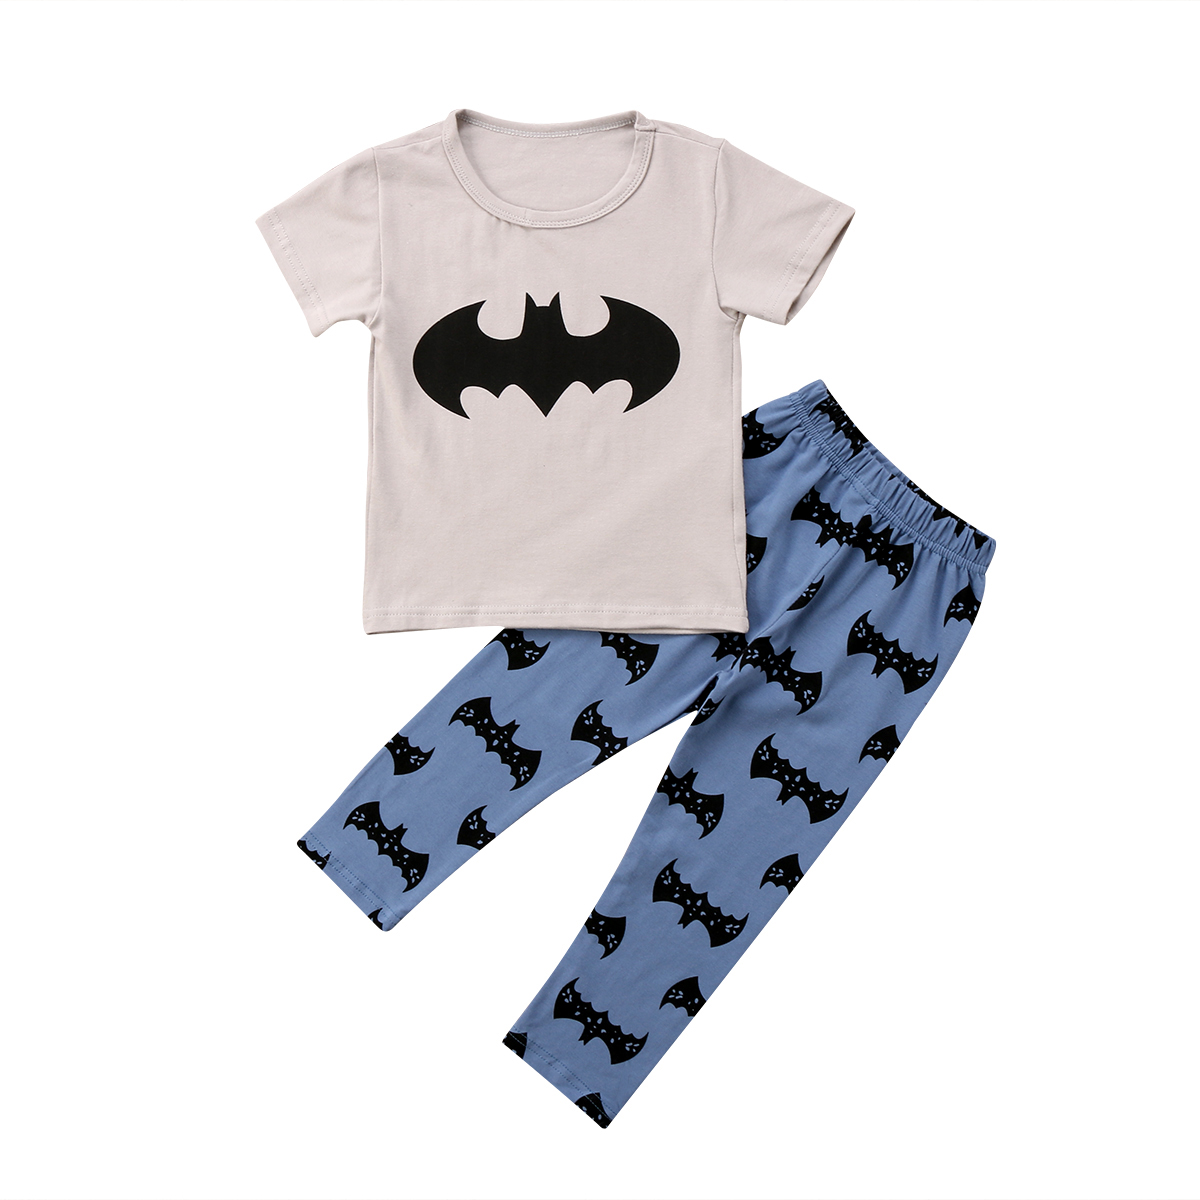 3f1025accbec 2pcs Baby Boy T shirt Grey Short Sleeves Tops+Pants Batman Leggings ...